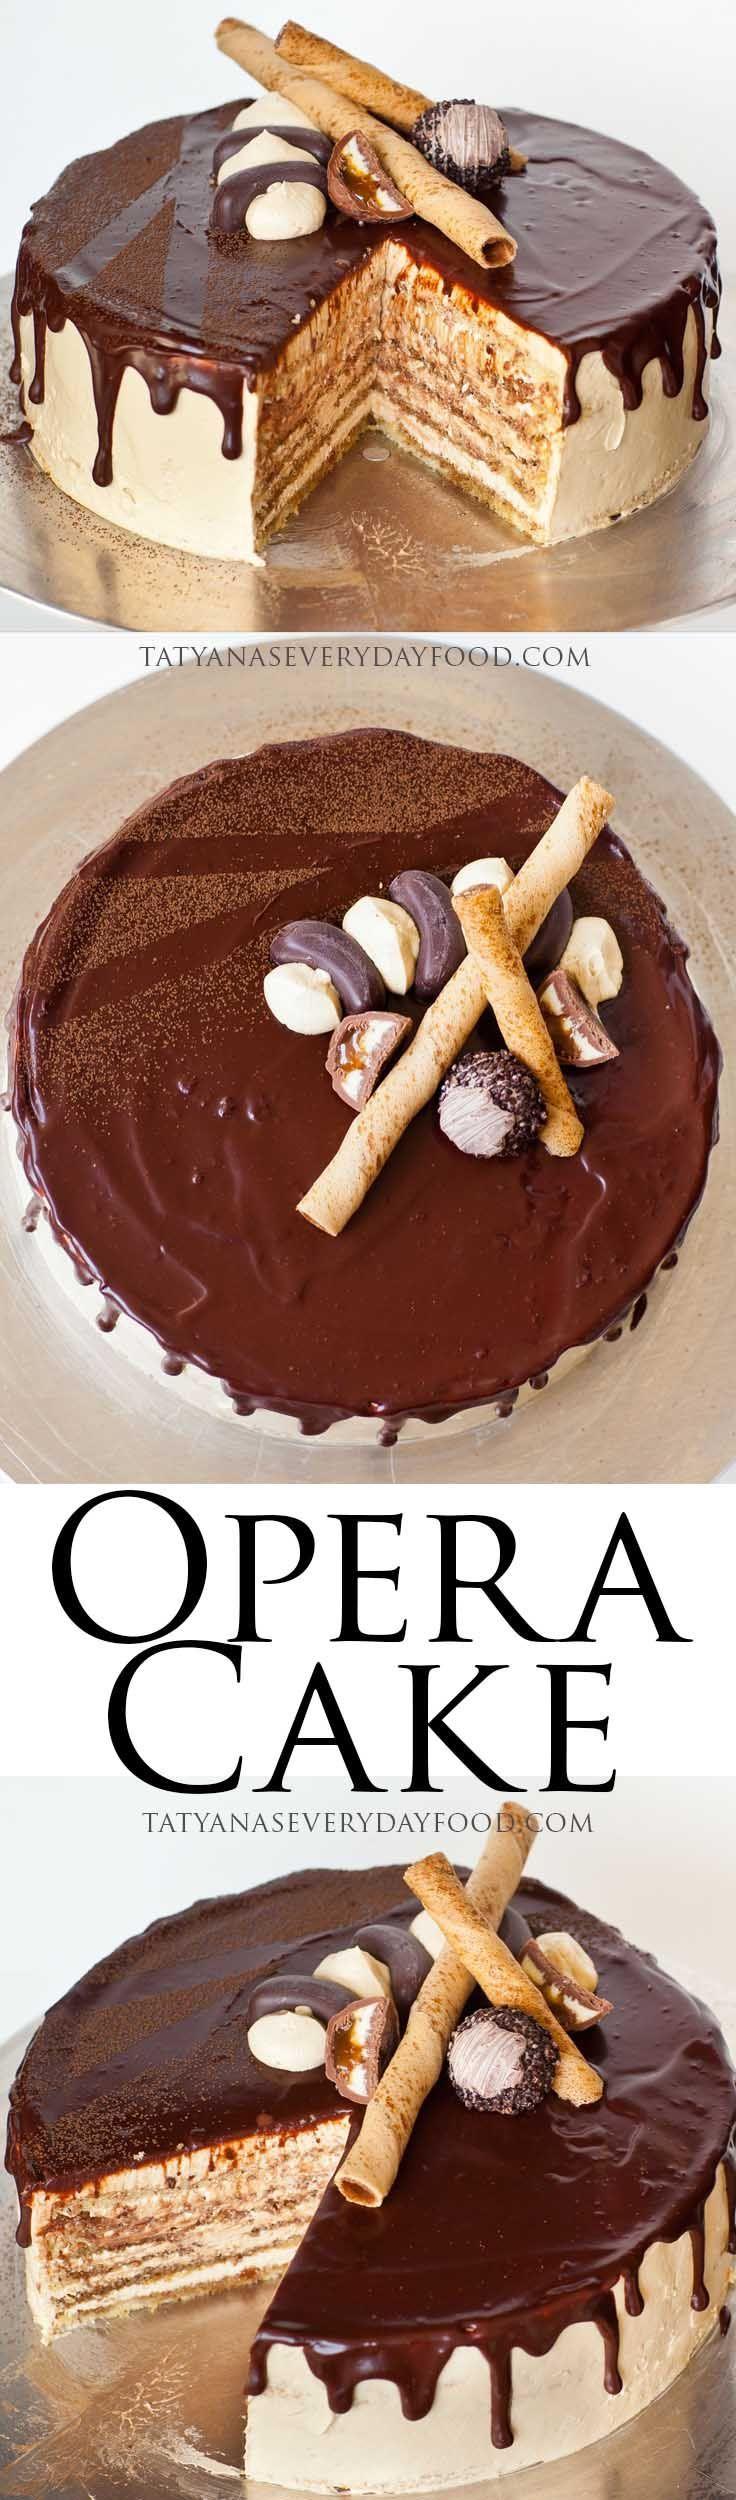 Chocolate Opera Cake Recipe Kevin Dundon